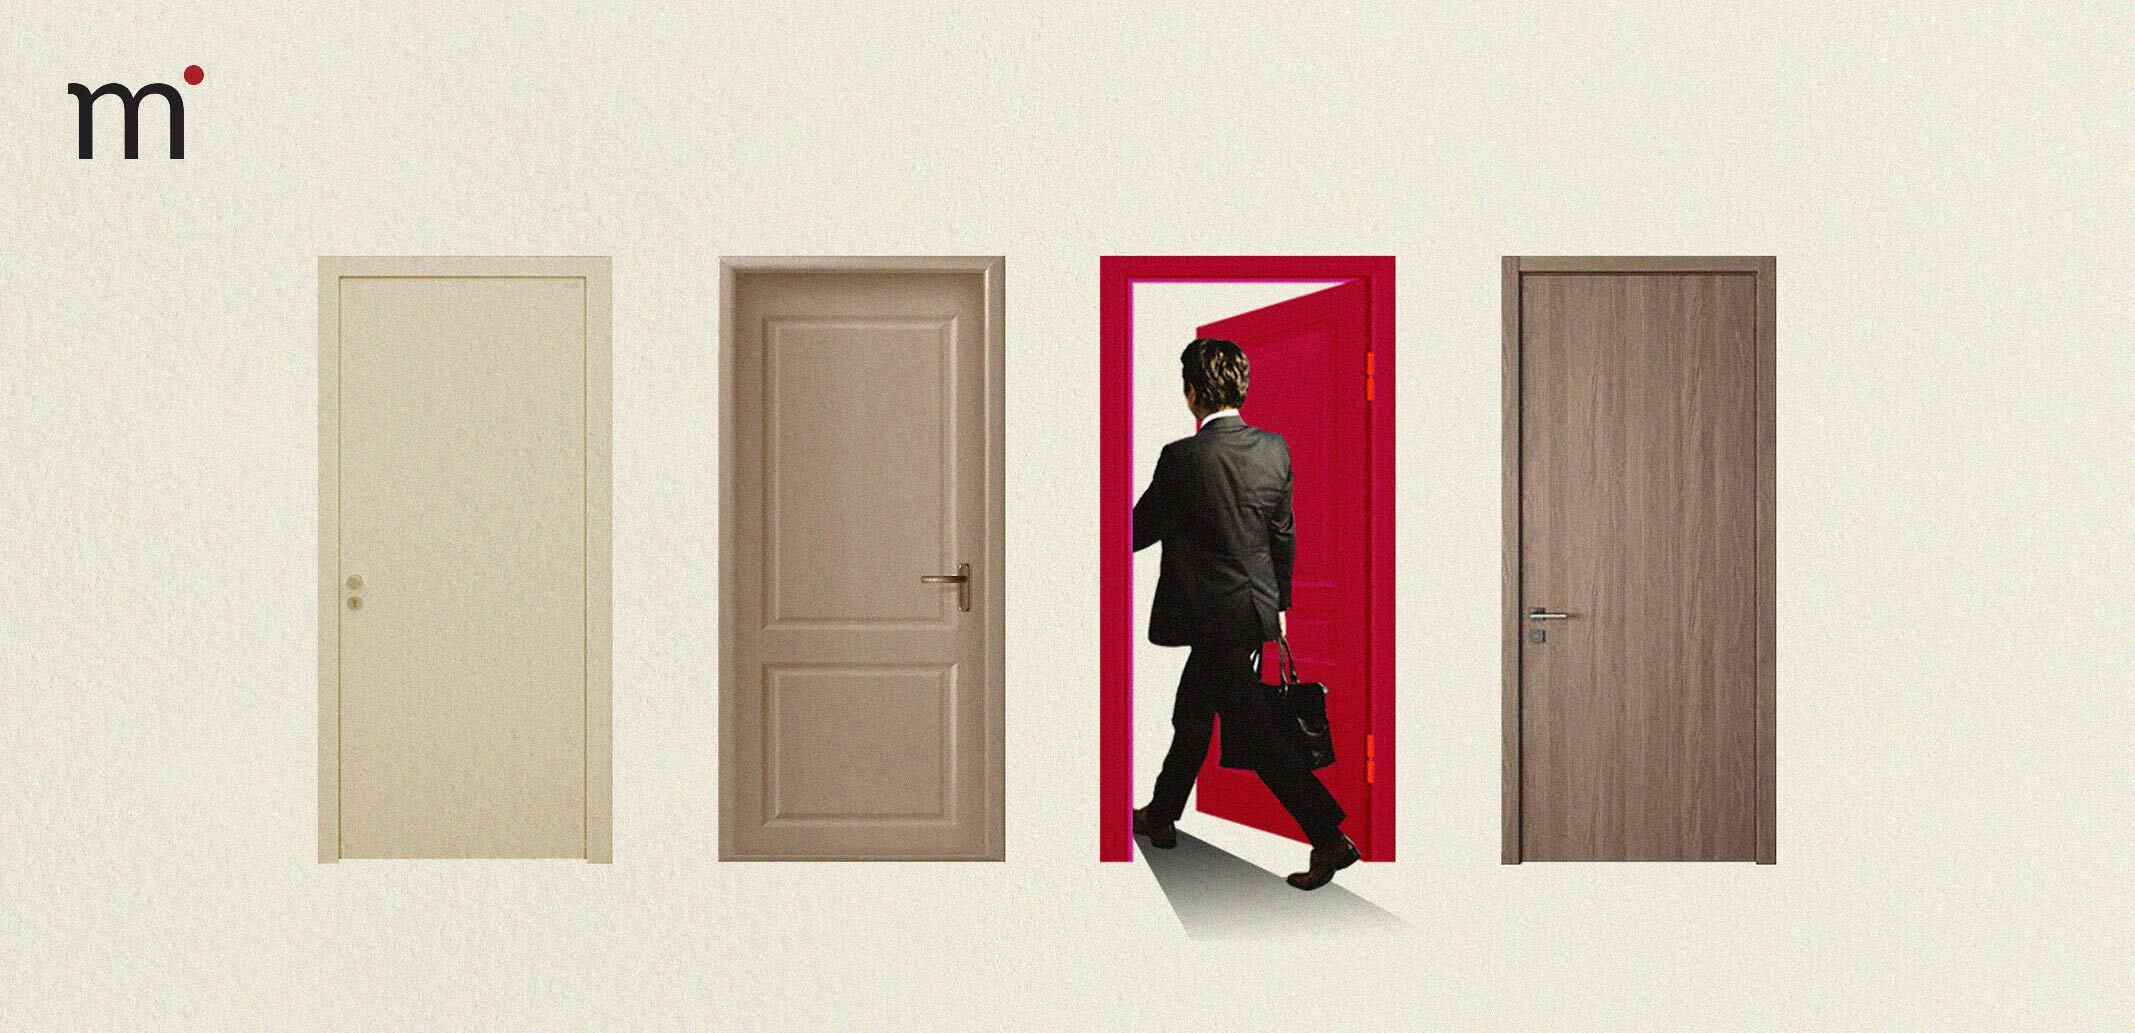 Choosing the right brand agency